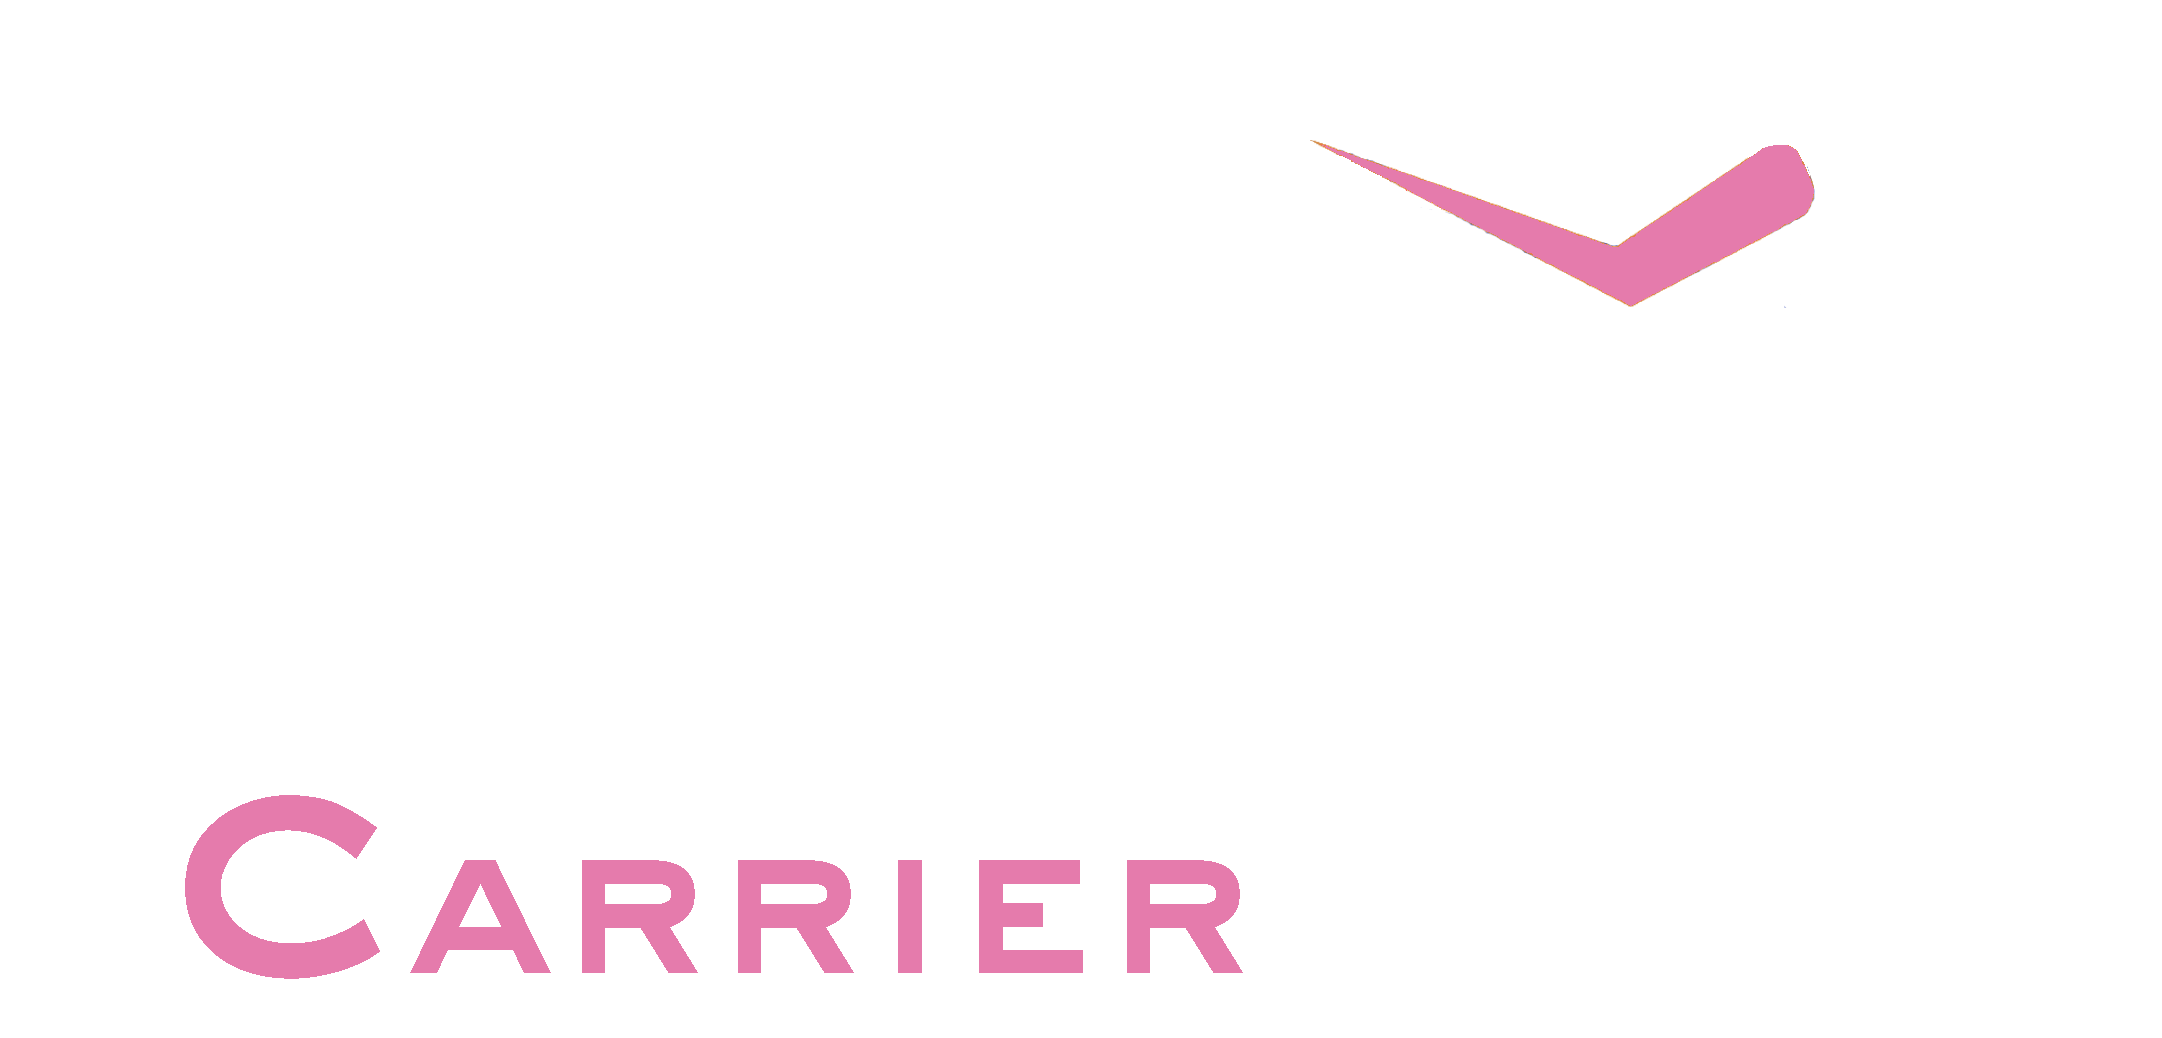 eCarrierCheck Logo for Breast Cancer Awareness Month